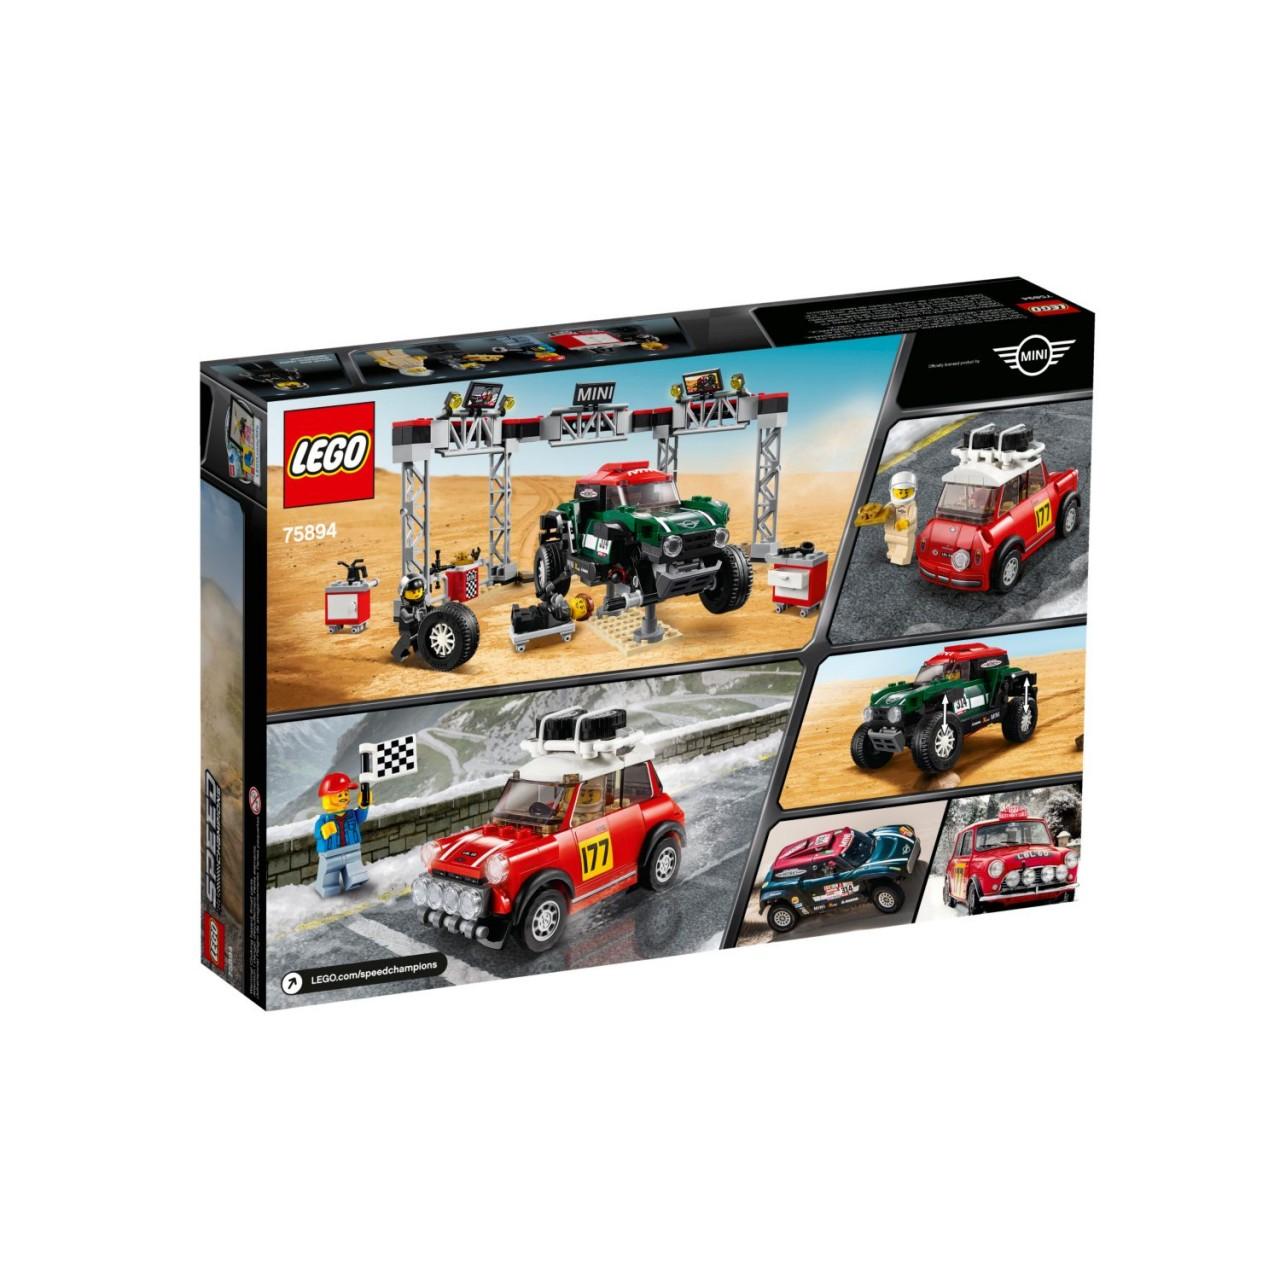 LEGO SPEED CHAMPIONS 75894 Rallyeauto 1967 Mini Cooper S und Buggy 2018 Mini John Cooper Works